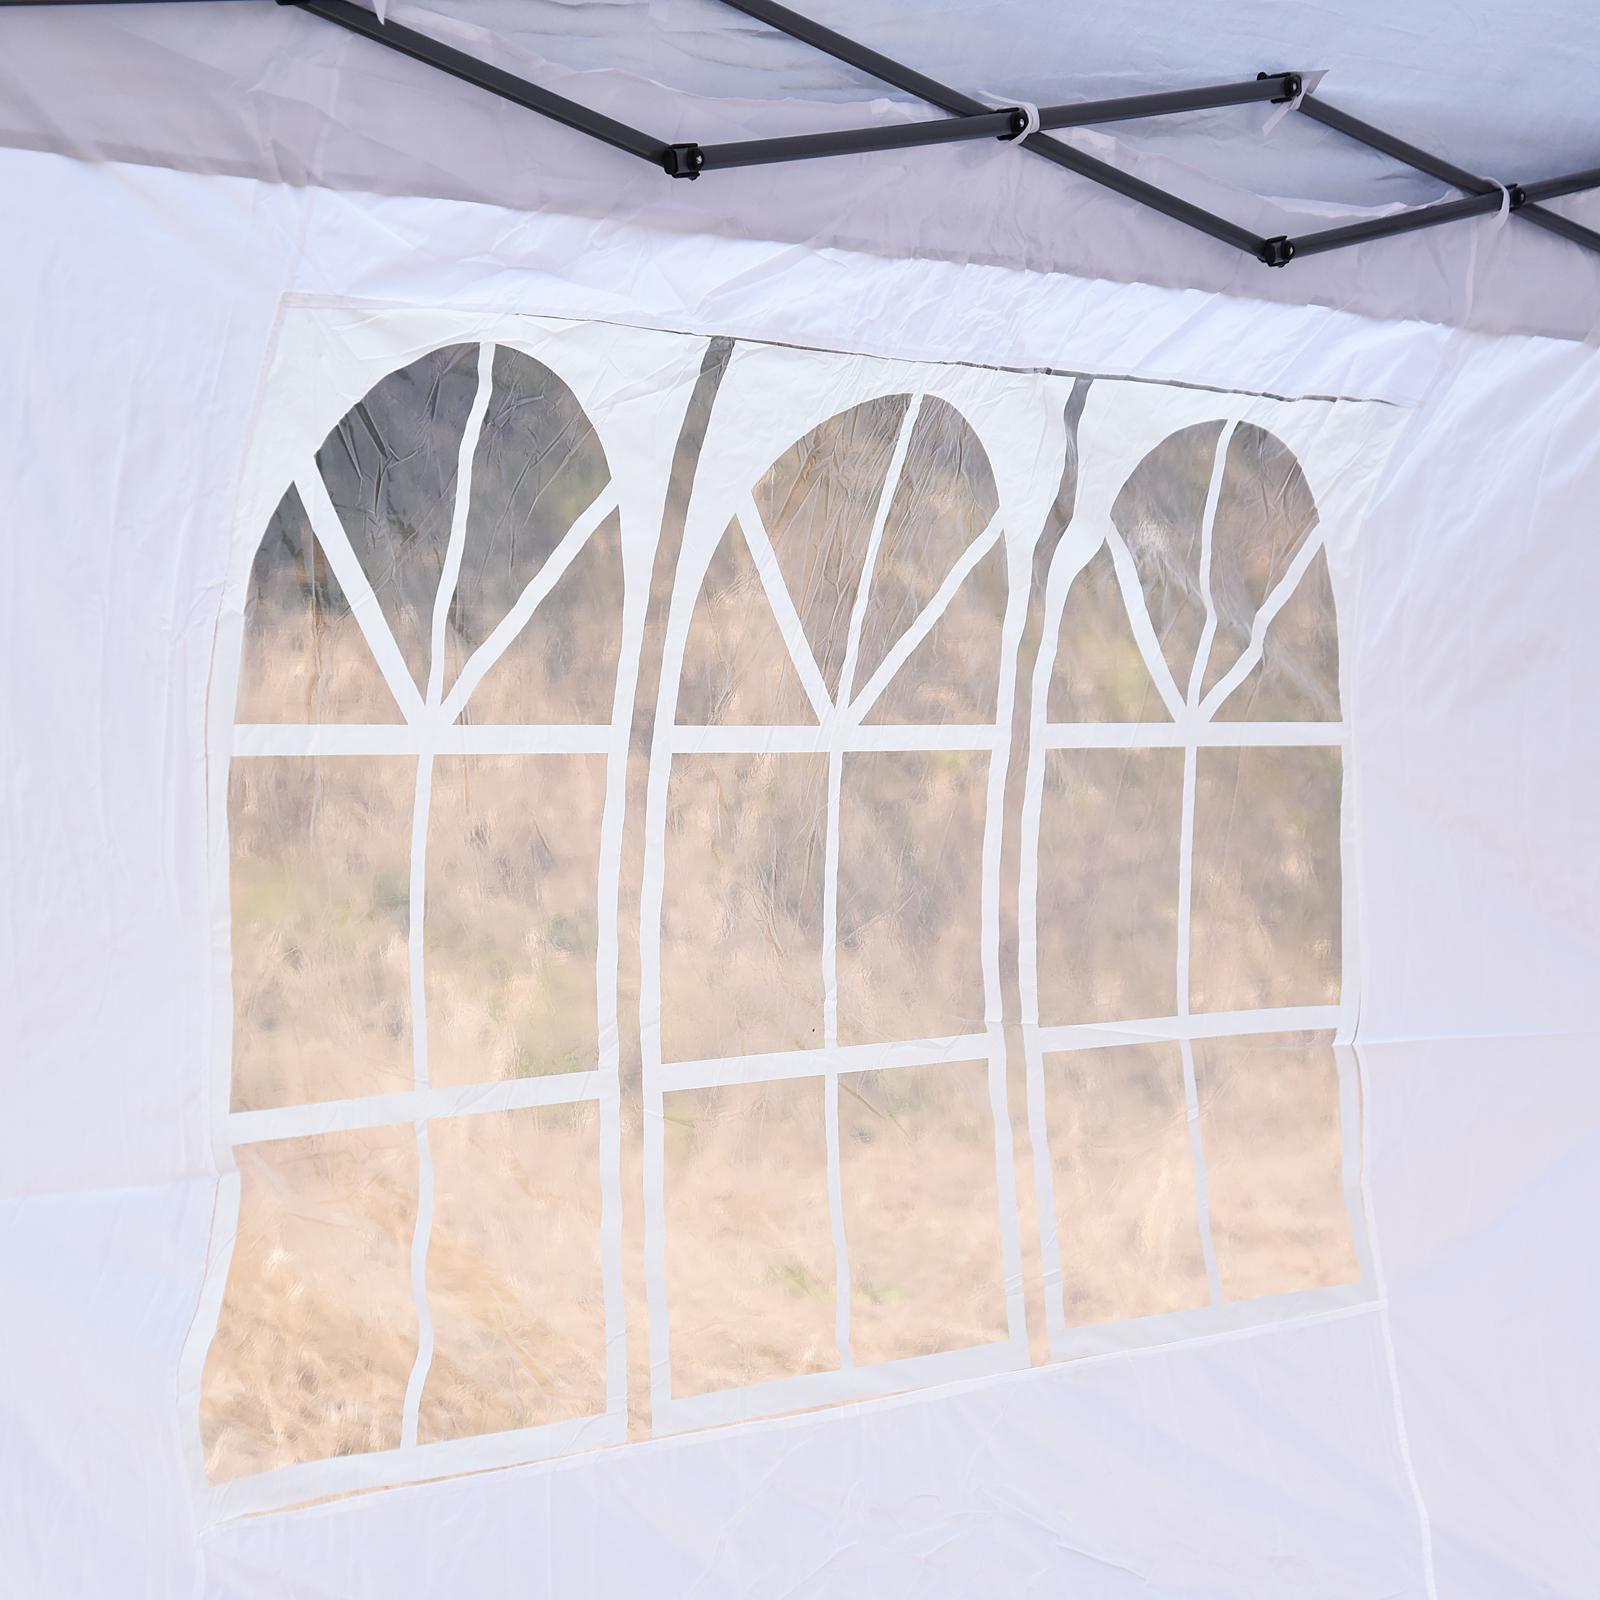 Outdoor-10-039-x20-039-EZ-POP-UP-Gazebo-Wedding-Party-Tent-Canopy-Folding-w-Carry-Bag thumbnail 52